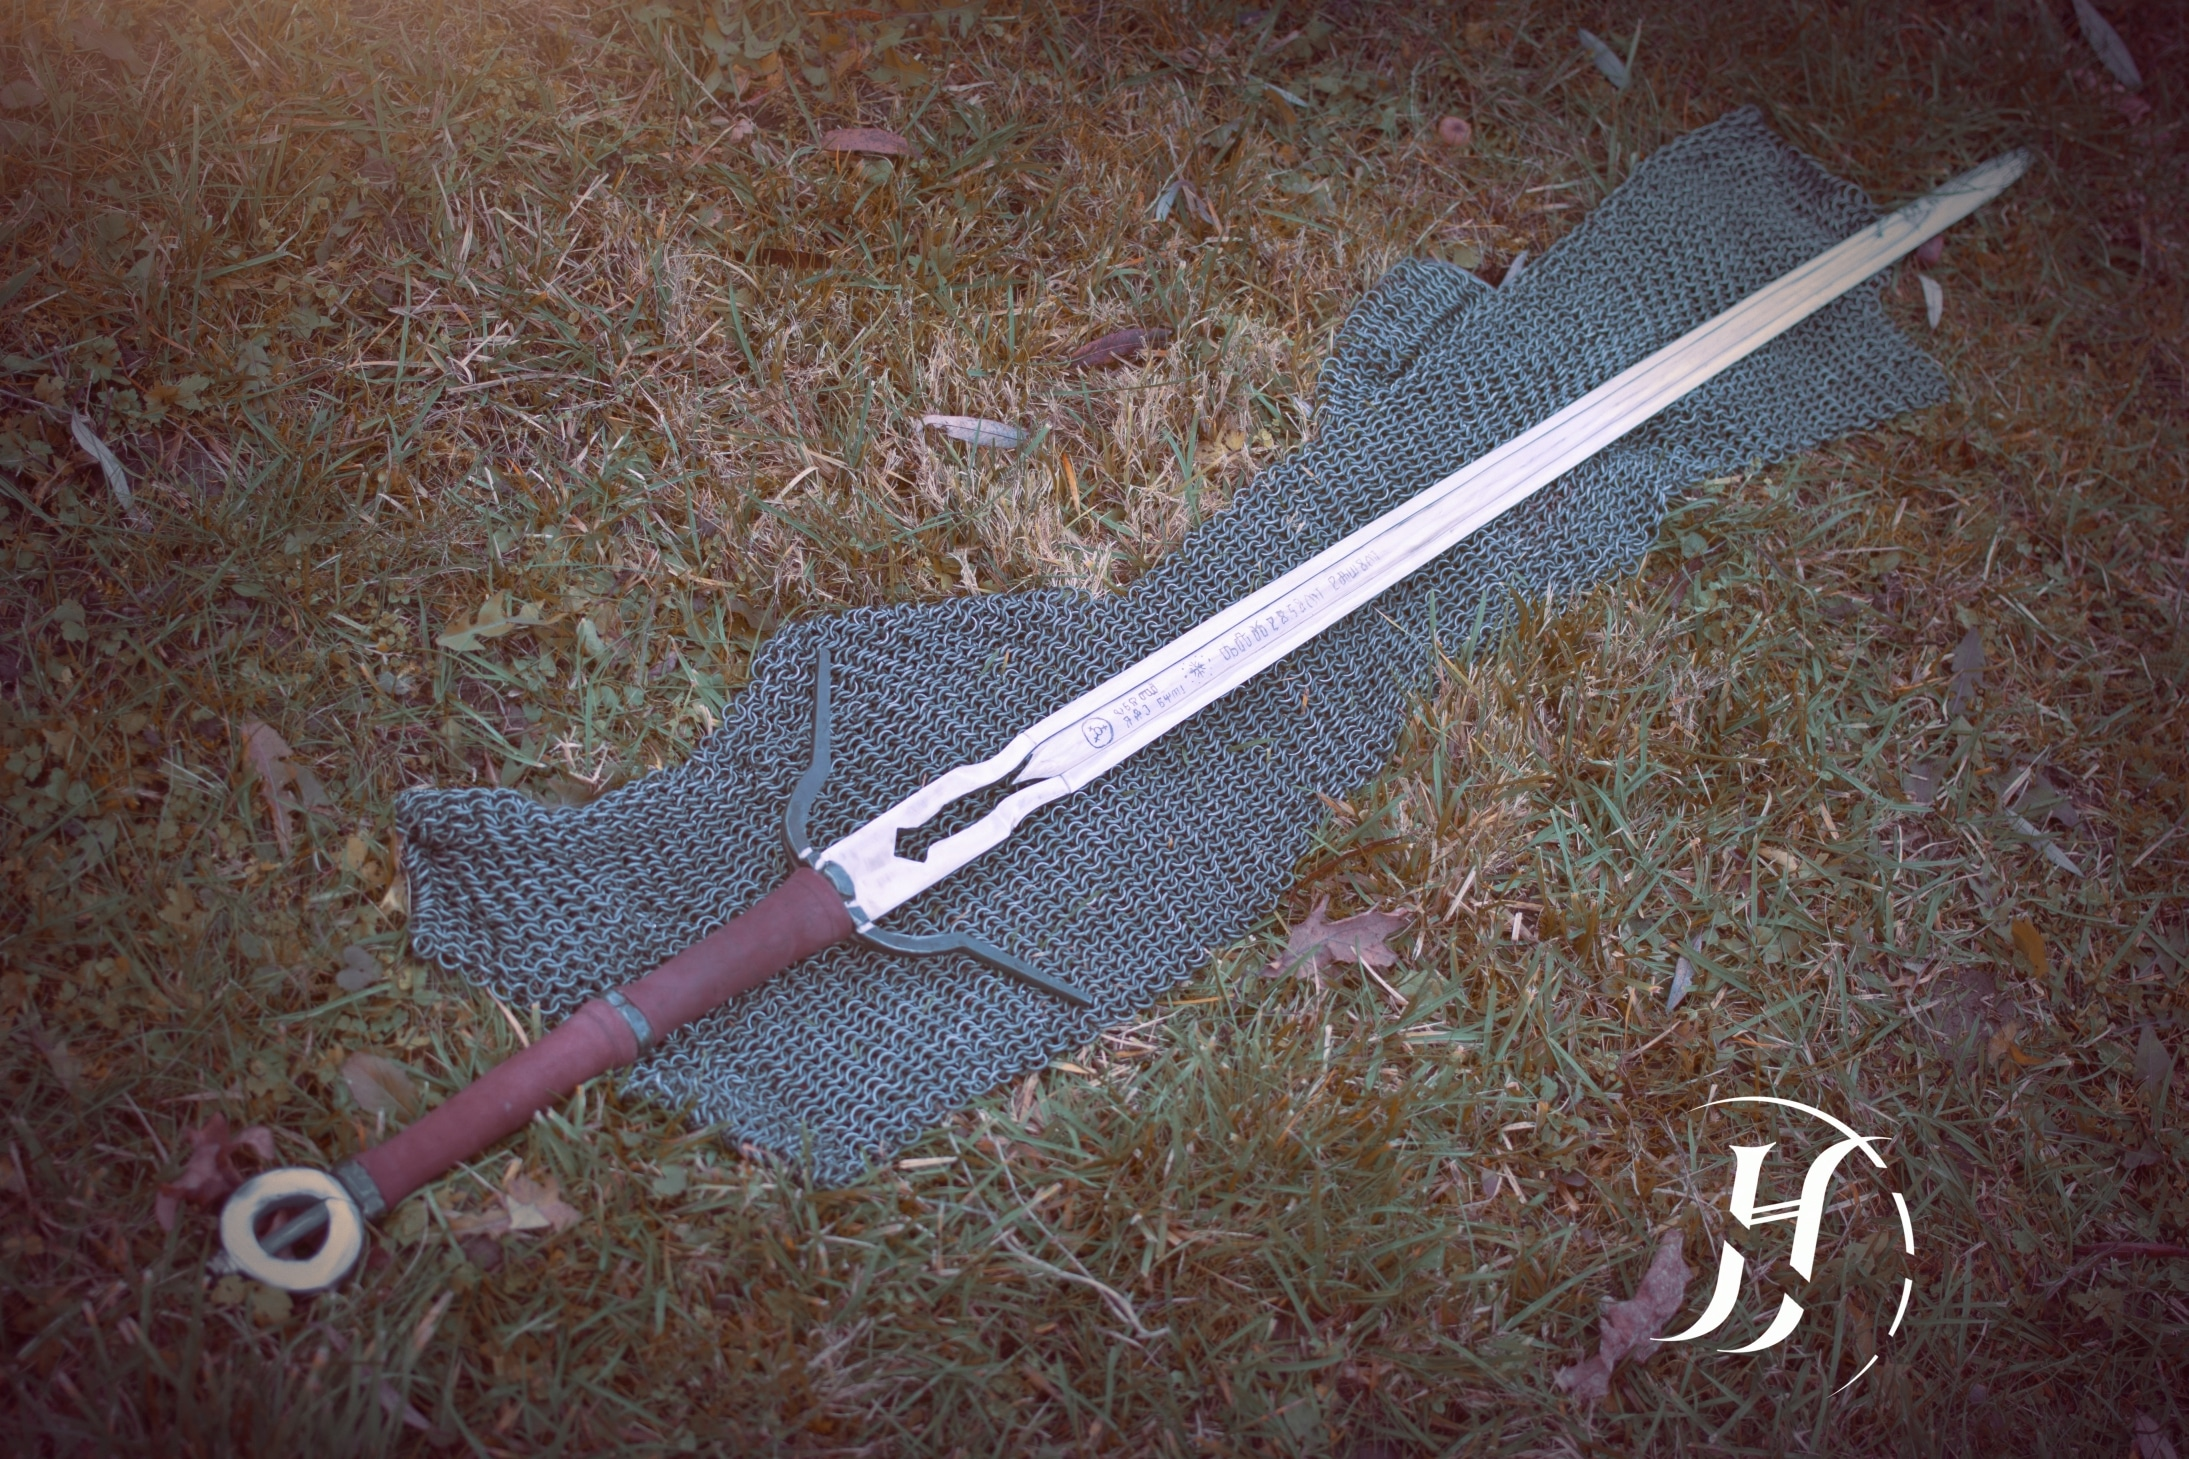 Schickes Schwert. (Foto: Alan Haart Padziński)